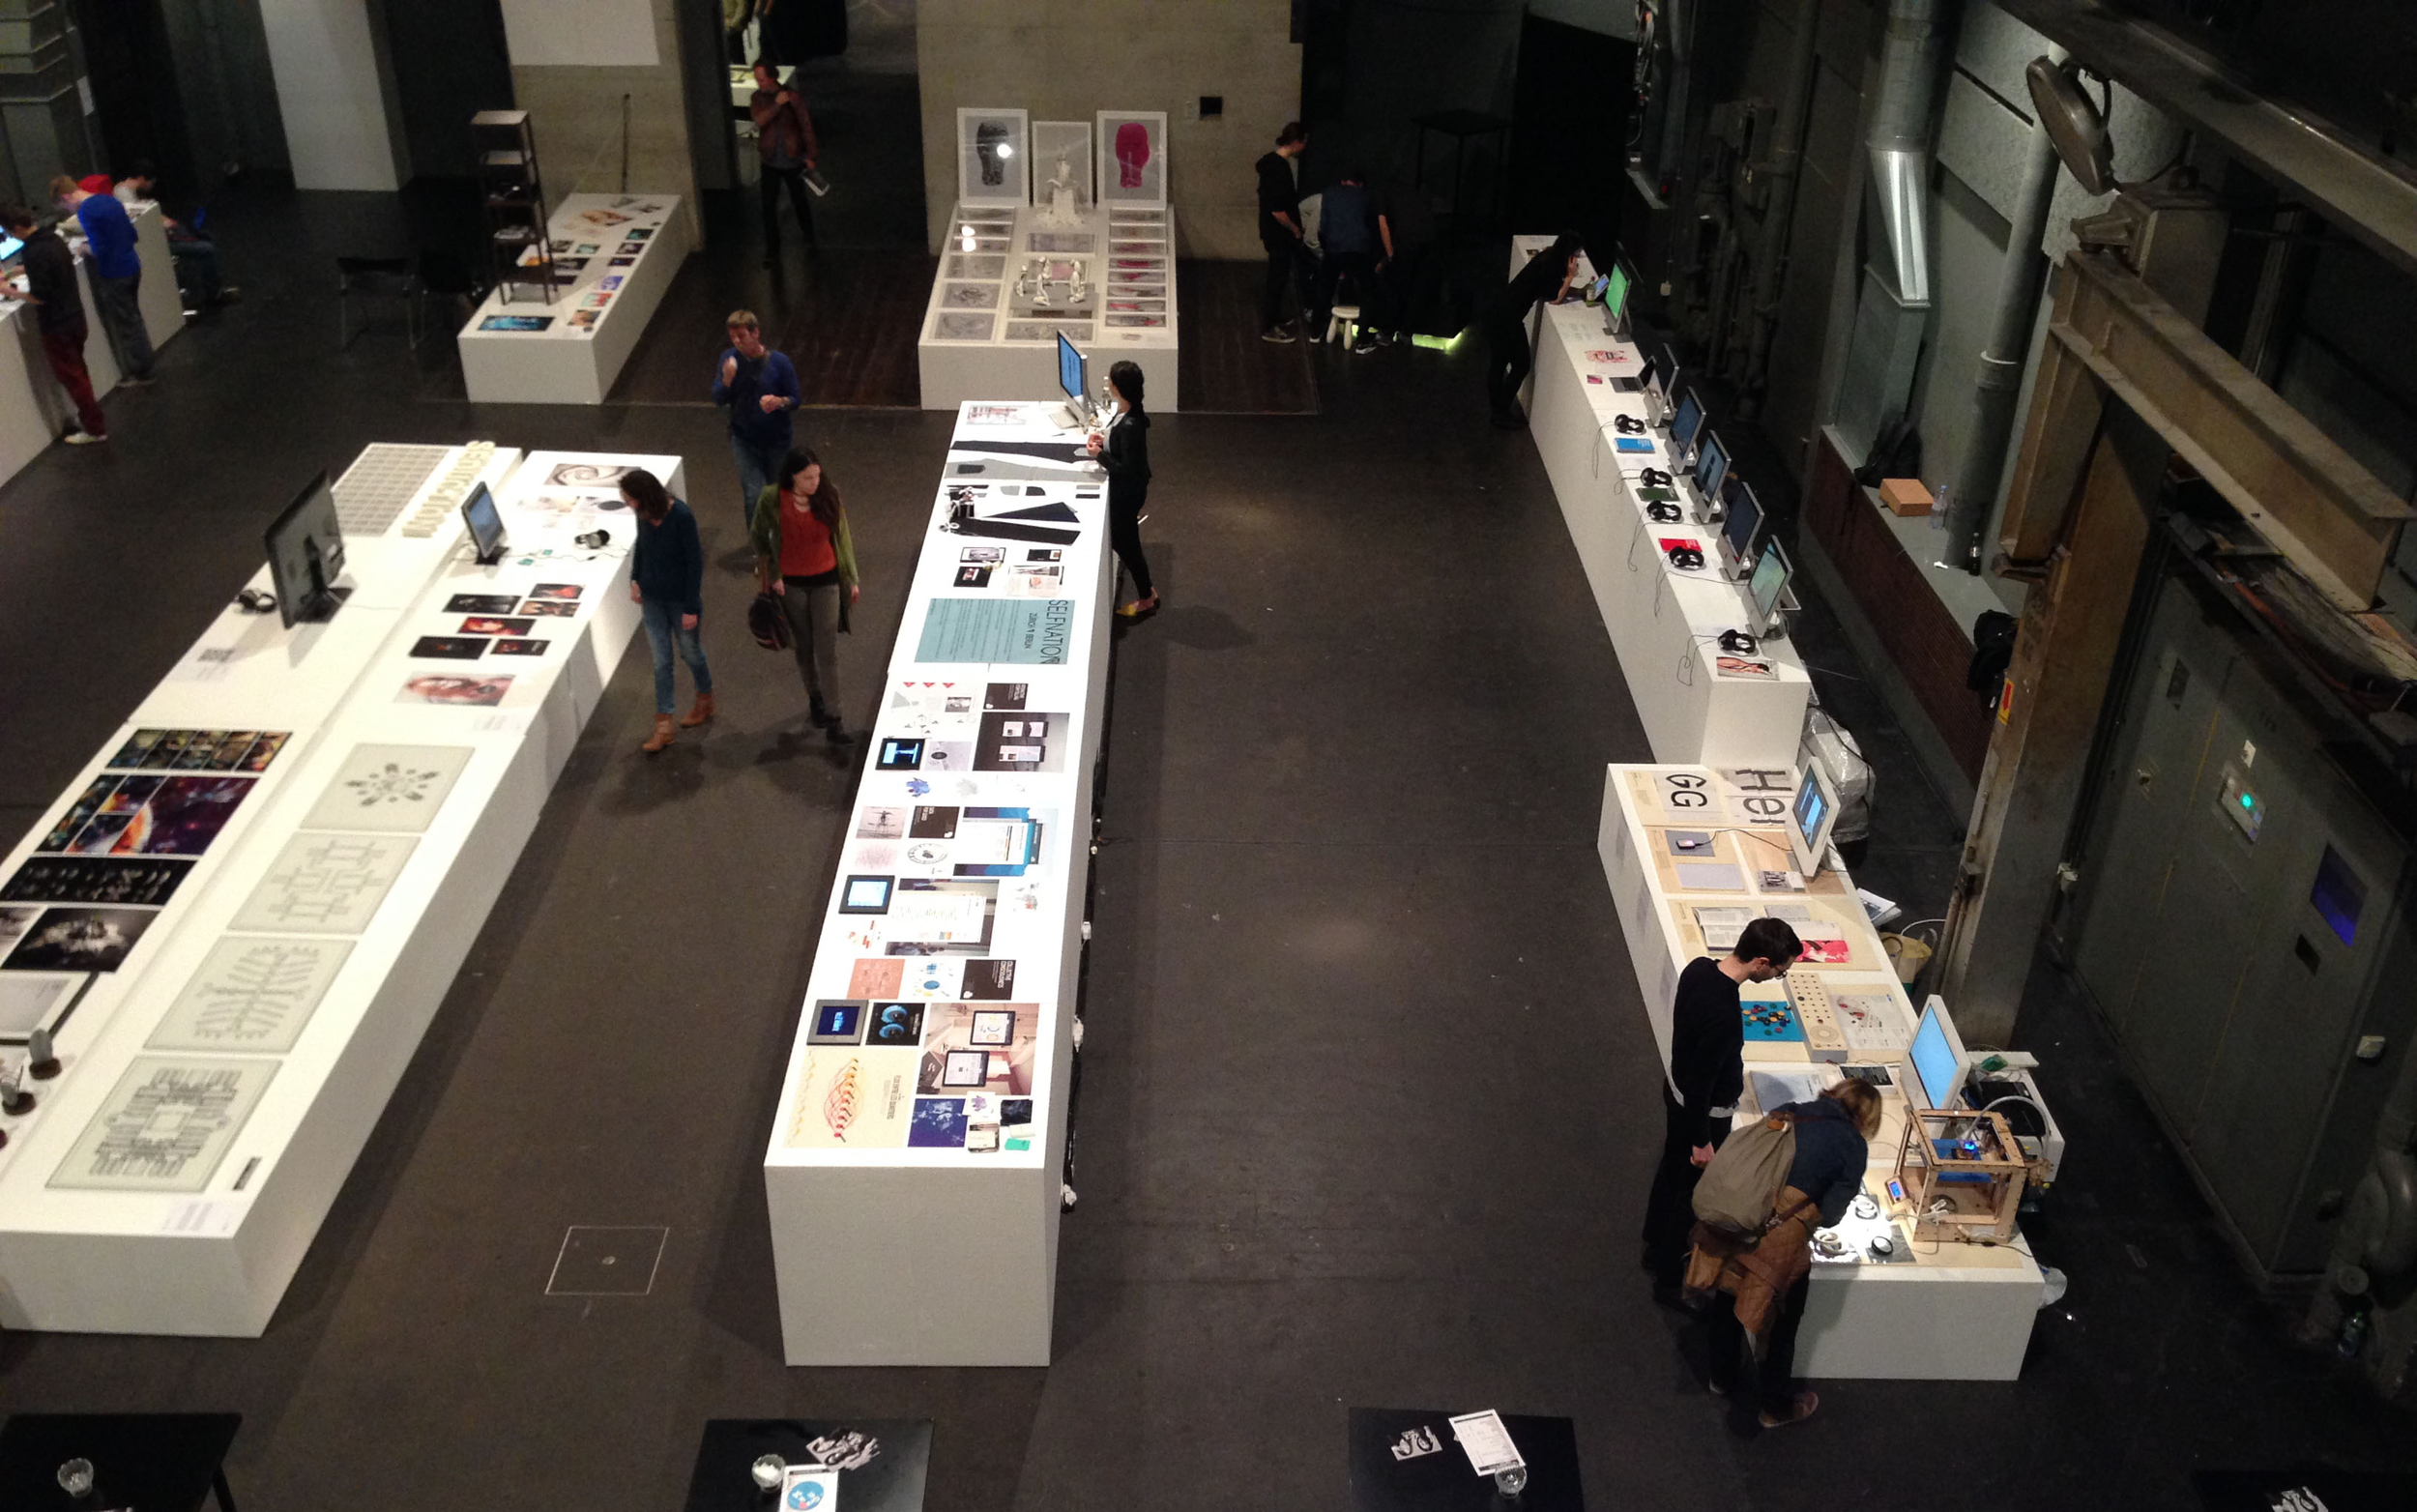 Area dedicated to digital & new media design